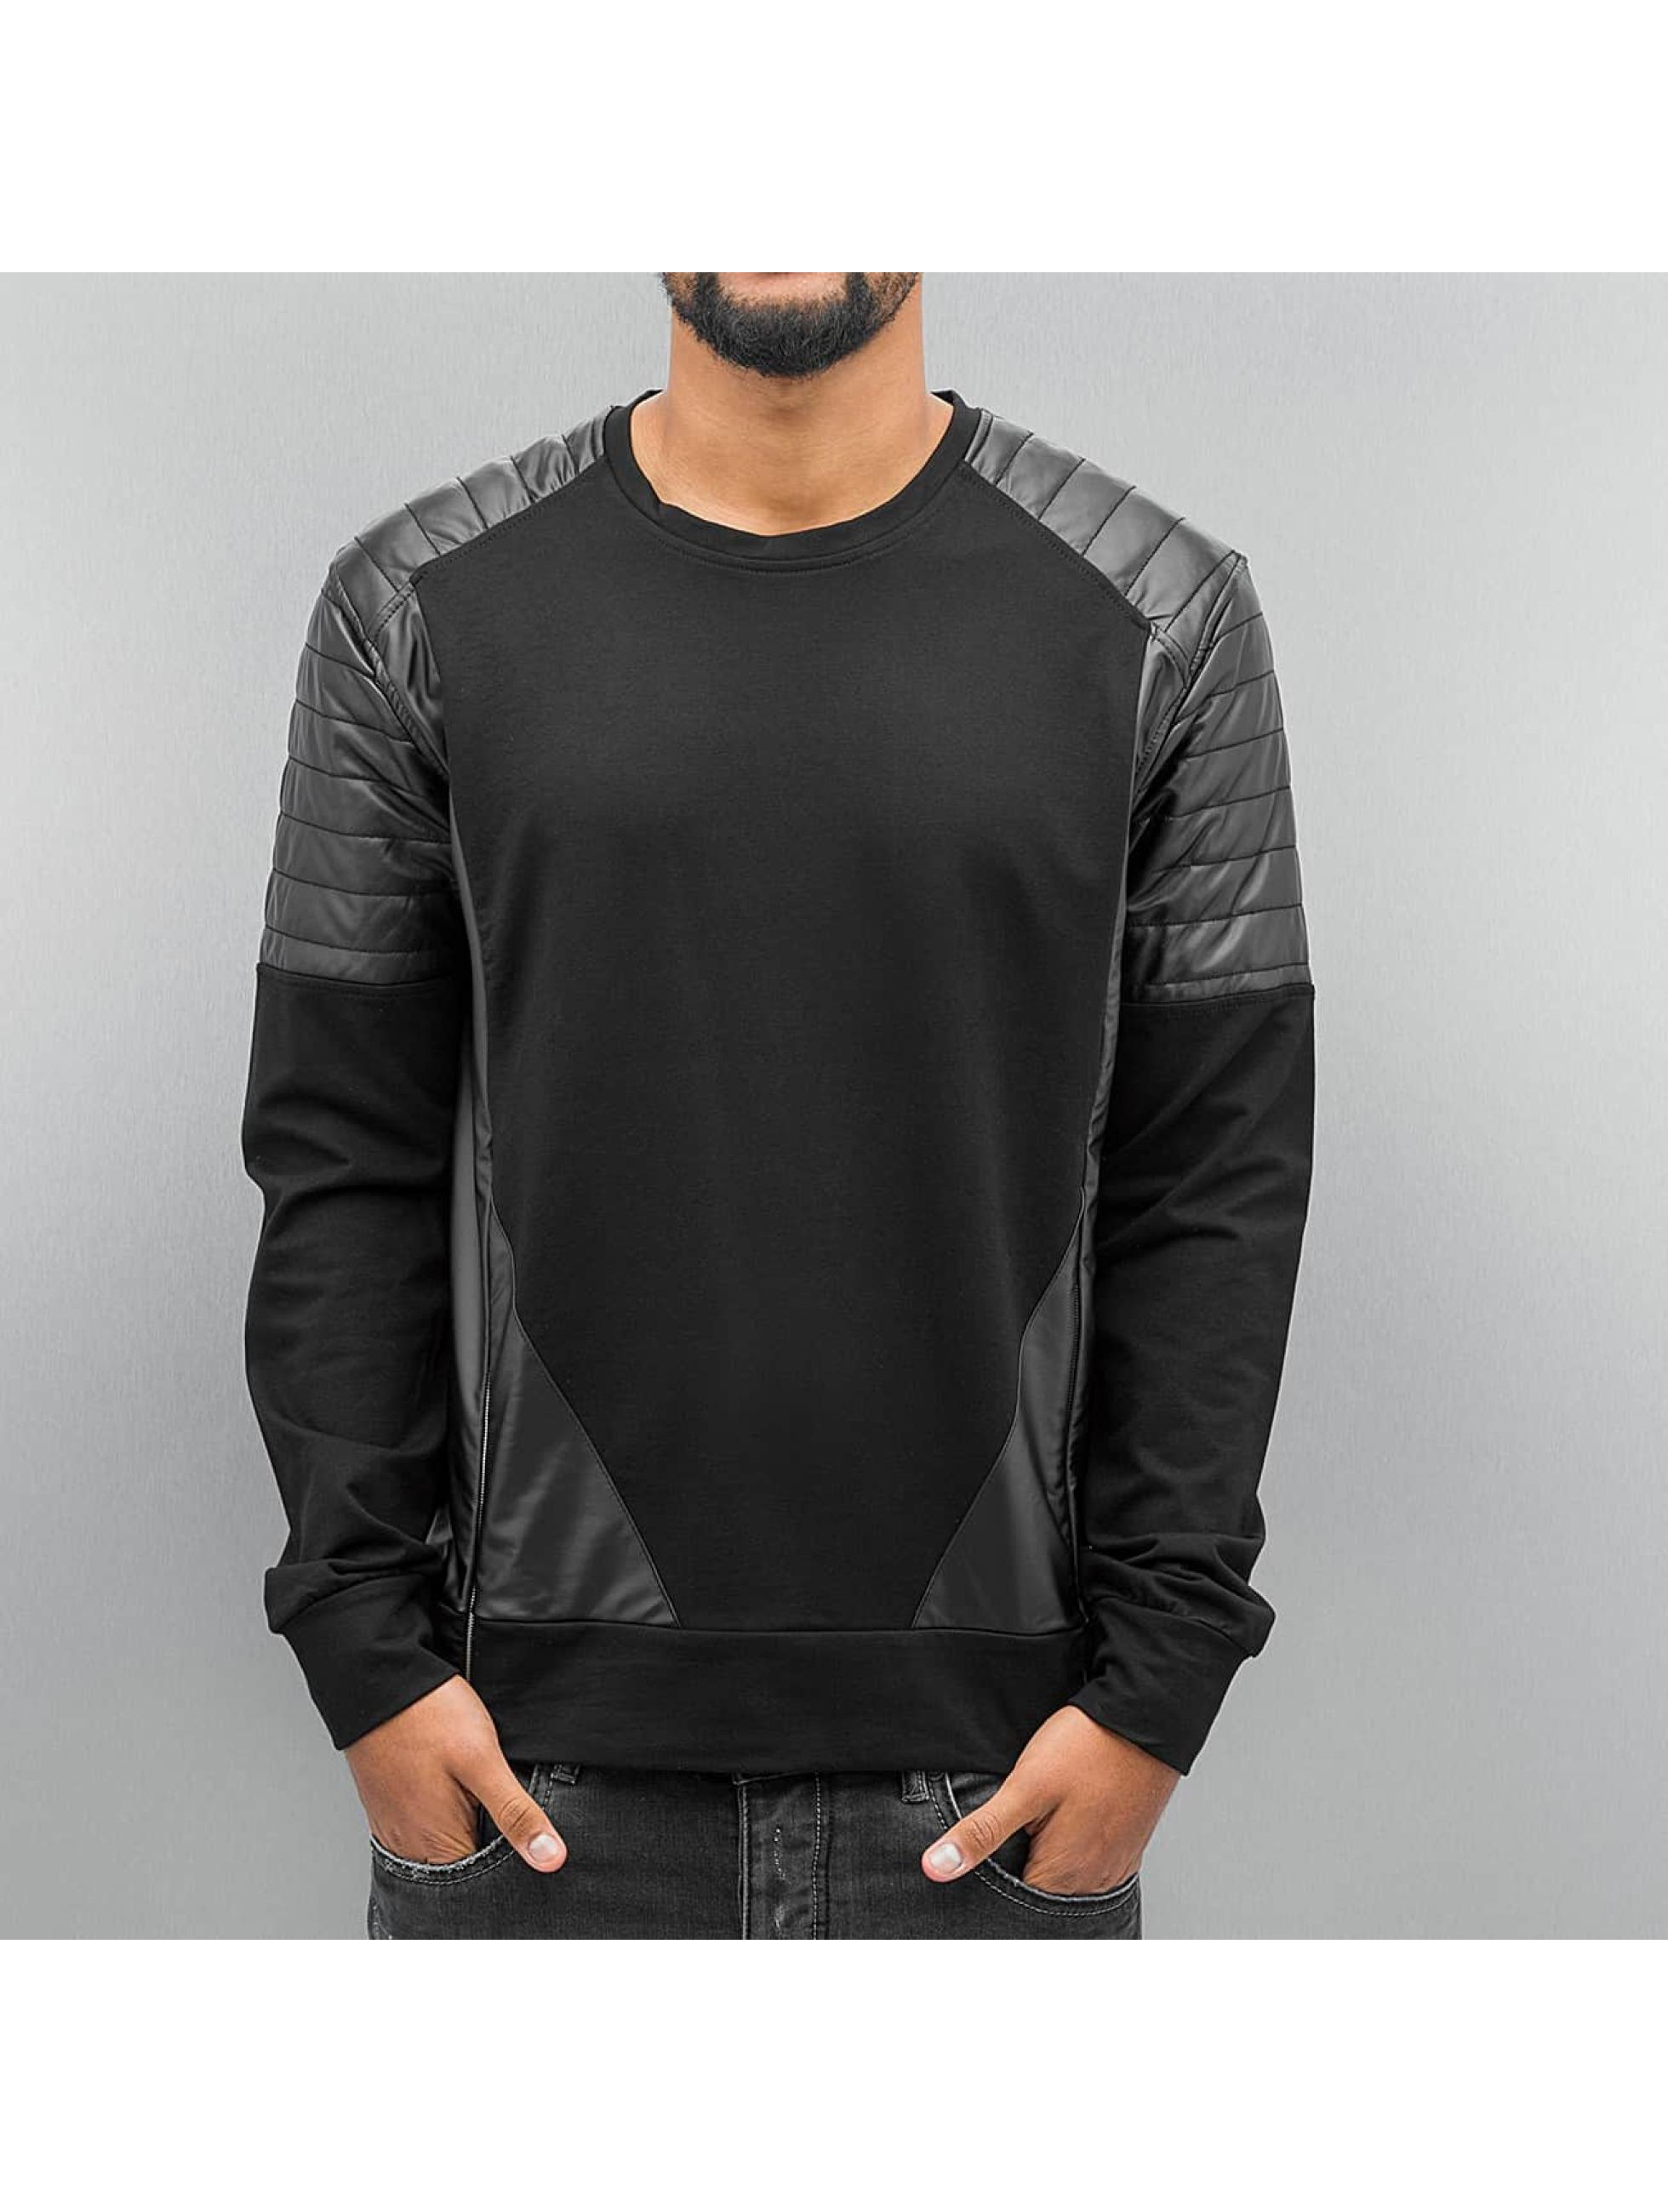 Cipo & Baxx Swetry Sweatshirt czarny